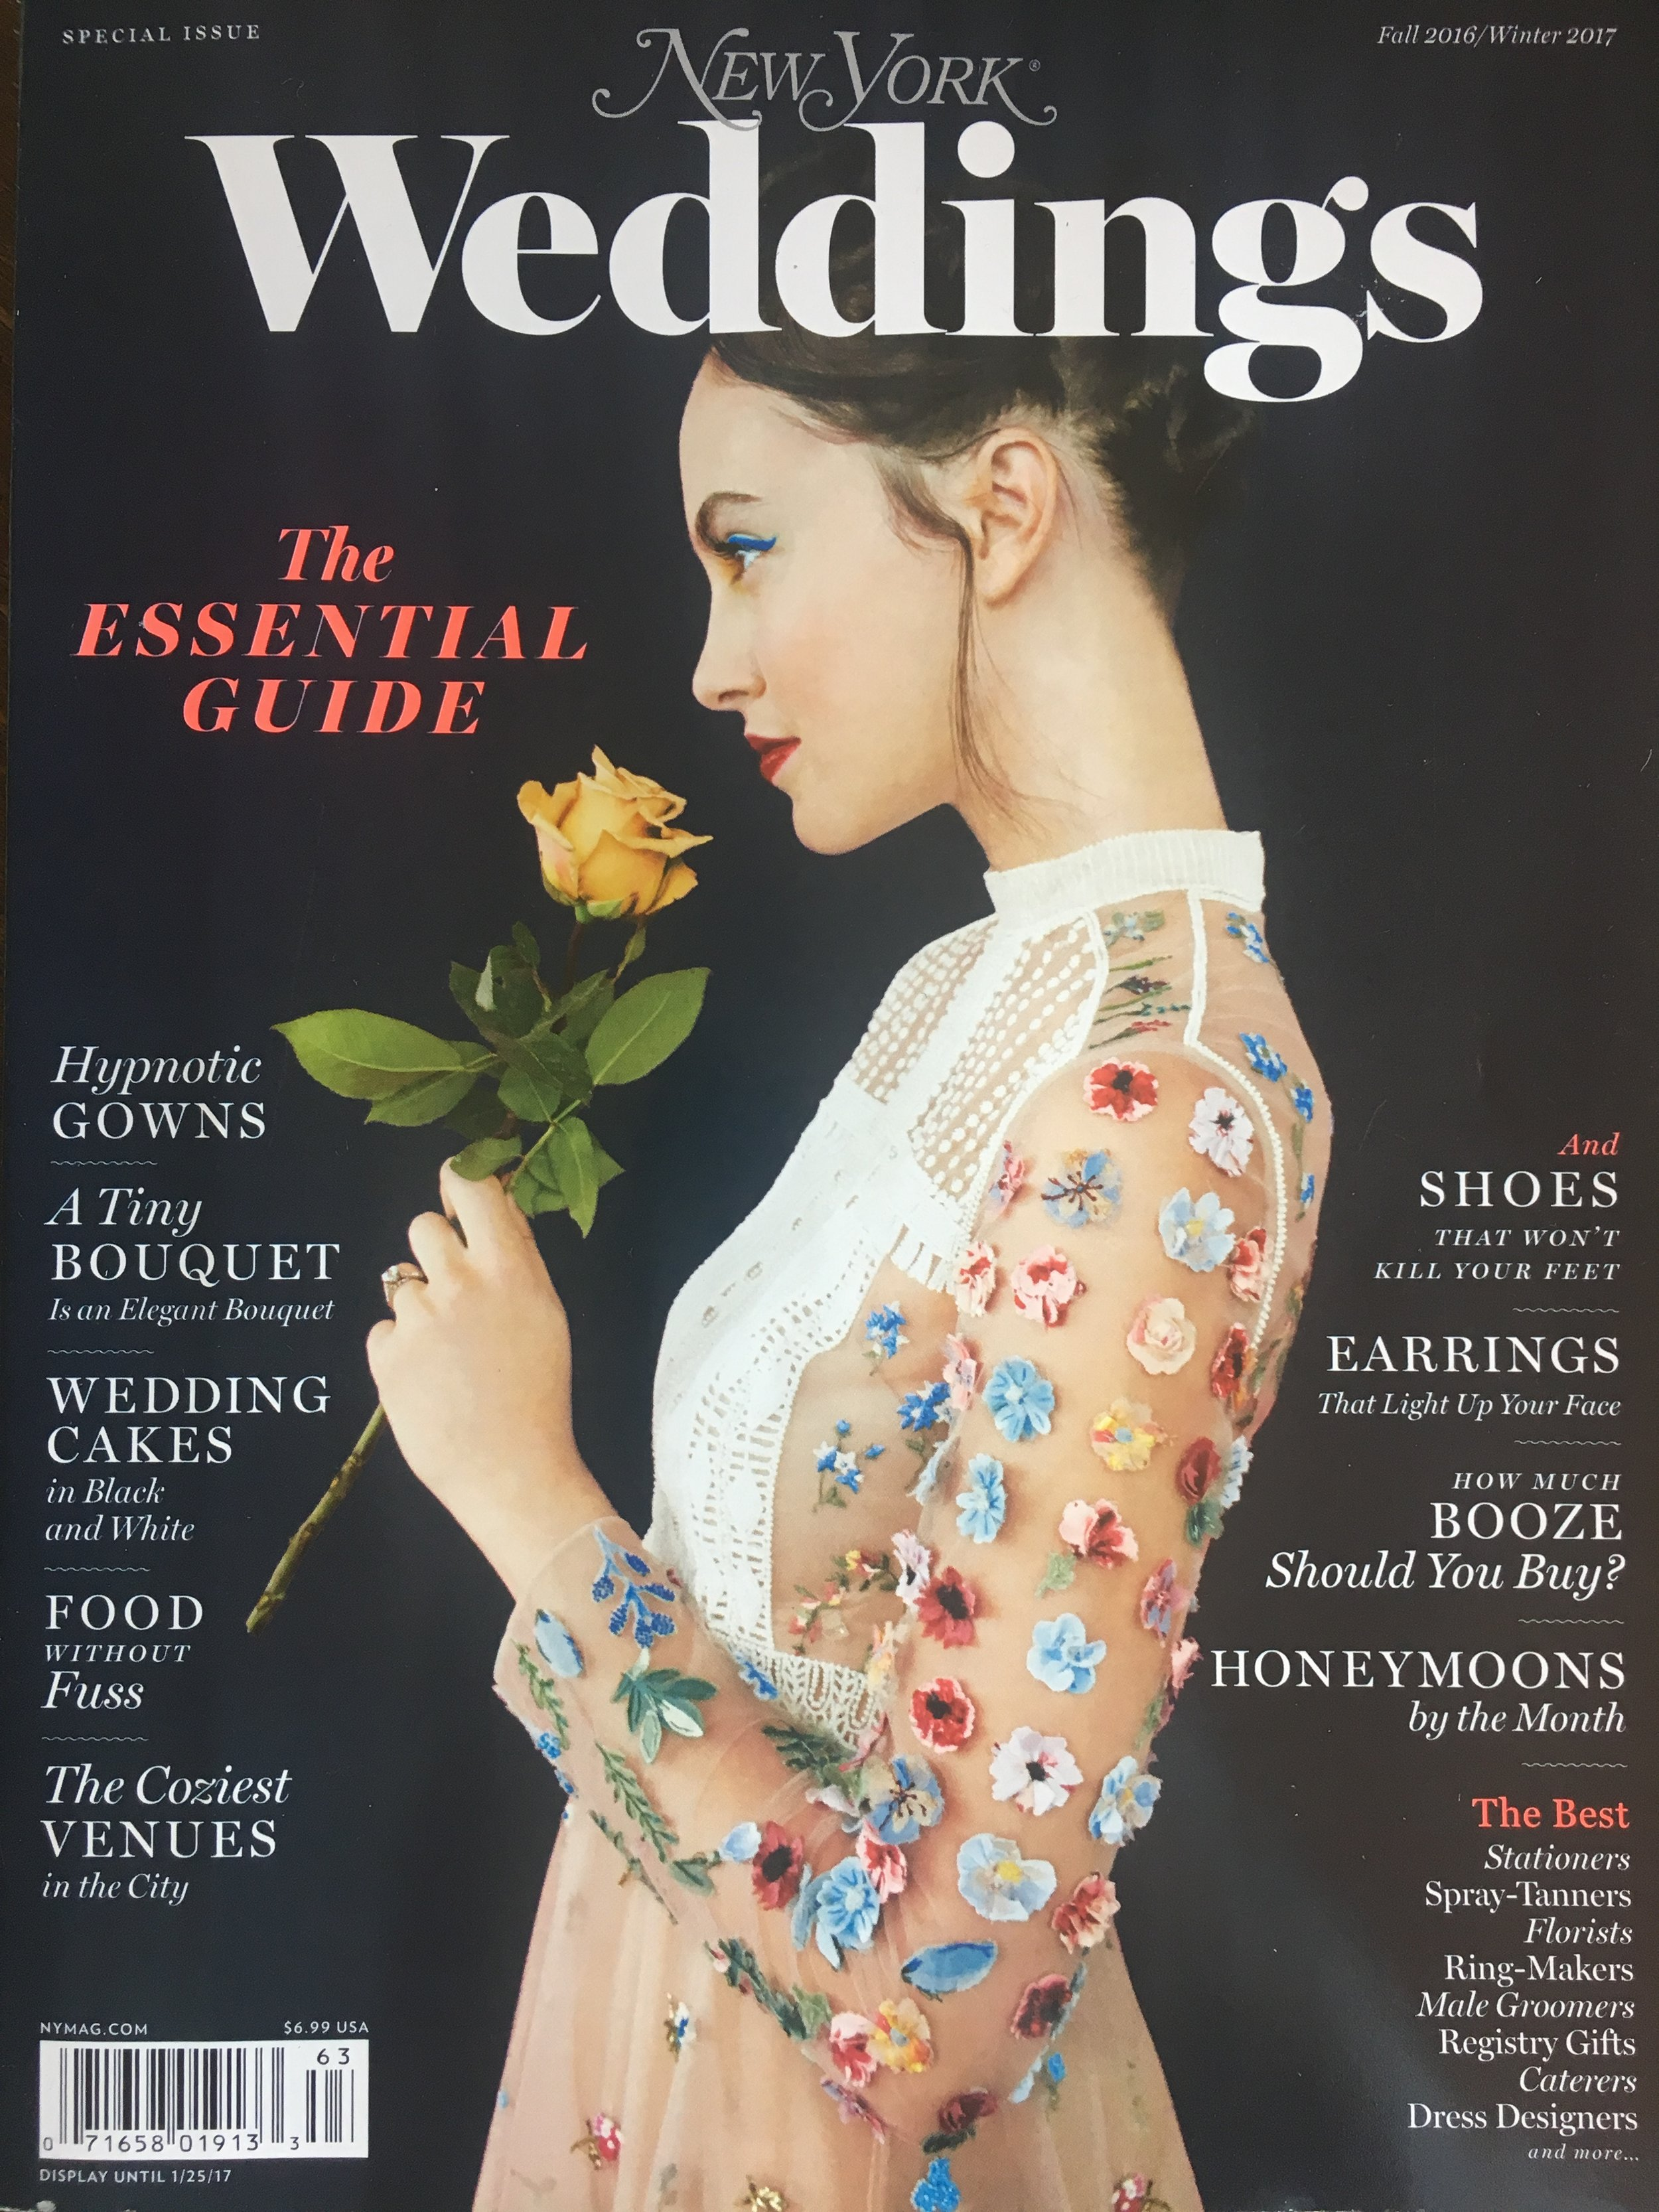 New York Magazine Weddings Fall Winter 2016 Cover.JPG